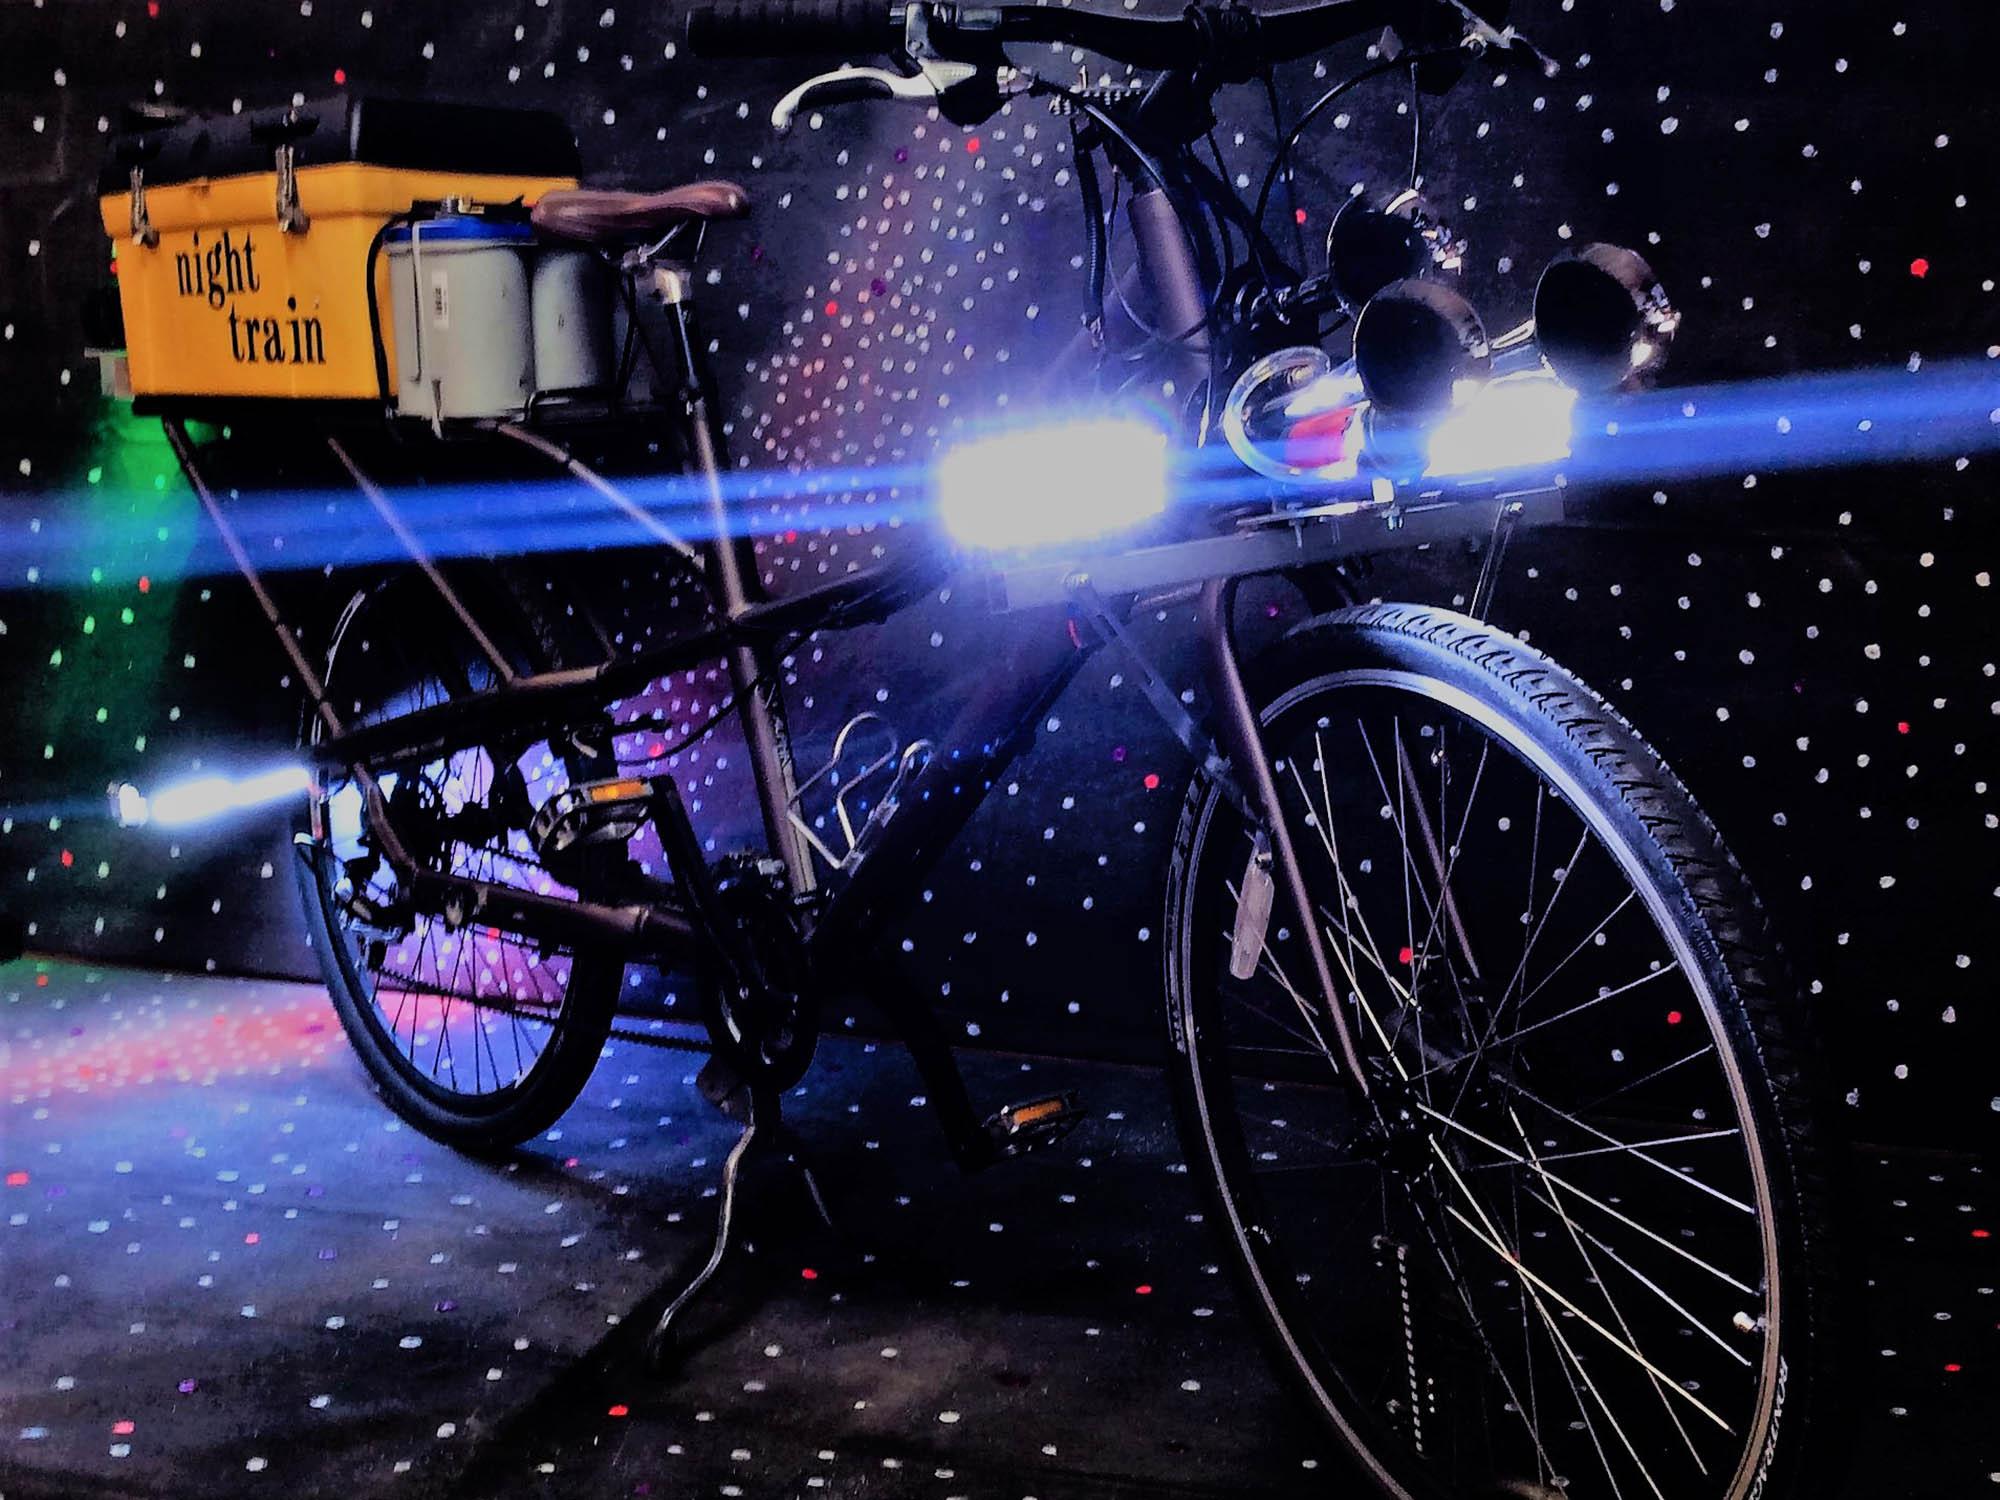 Bike Tour on Mission Trail